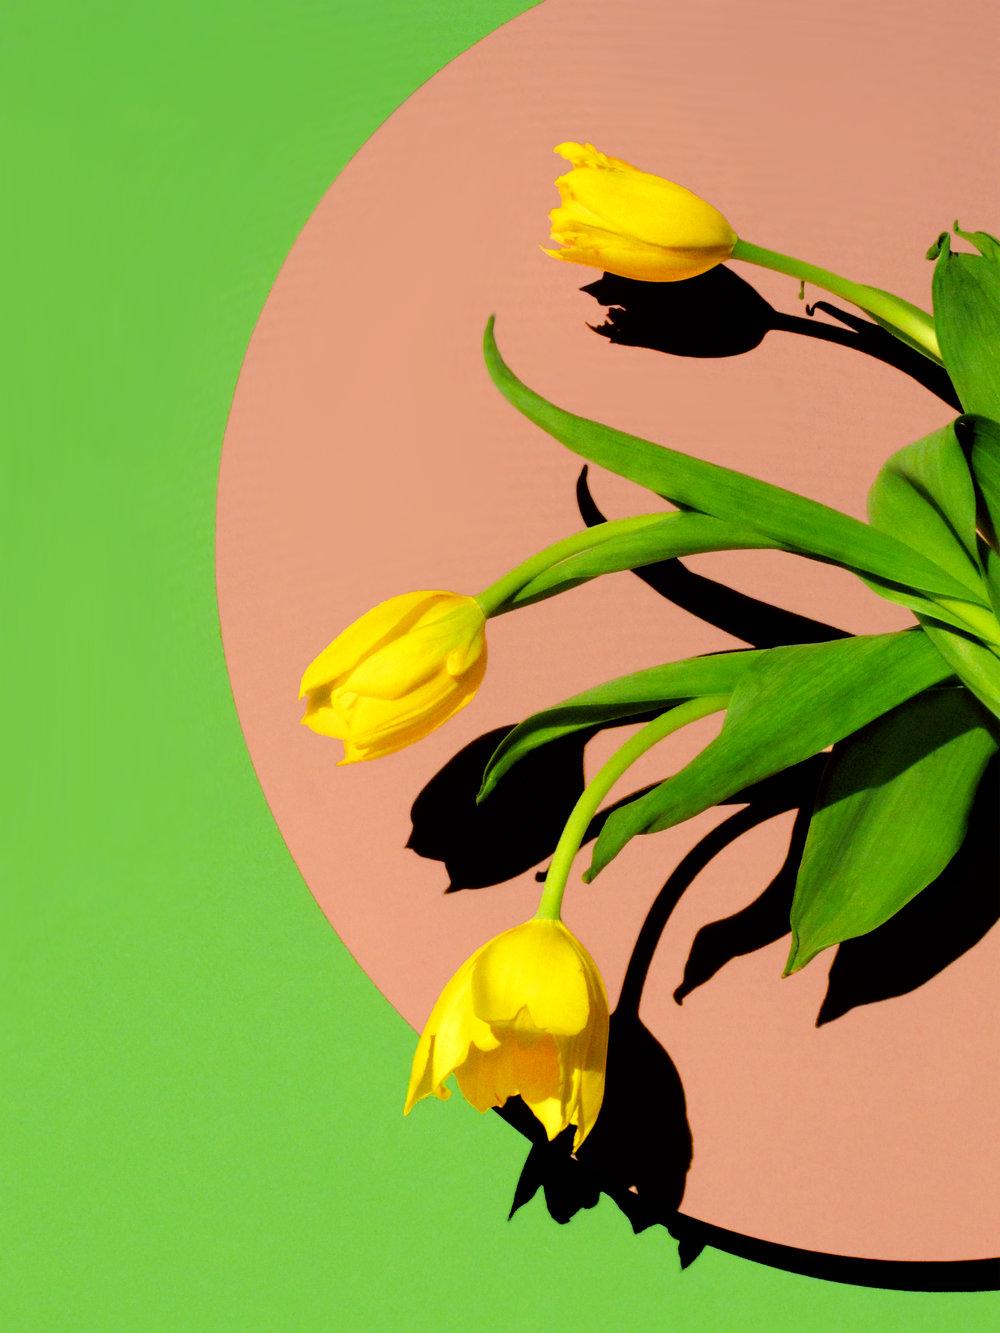 12x16_pink_green_tulip.jpg